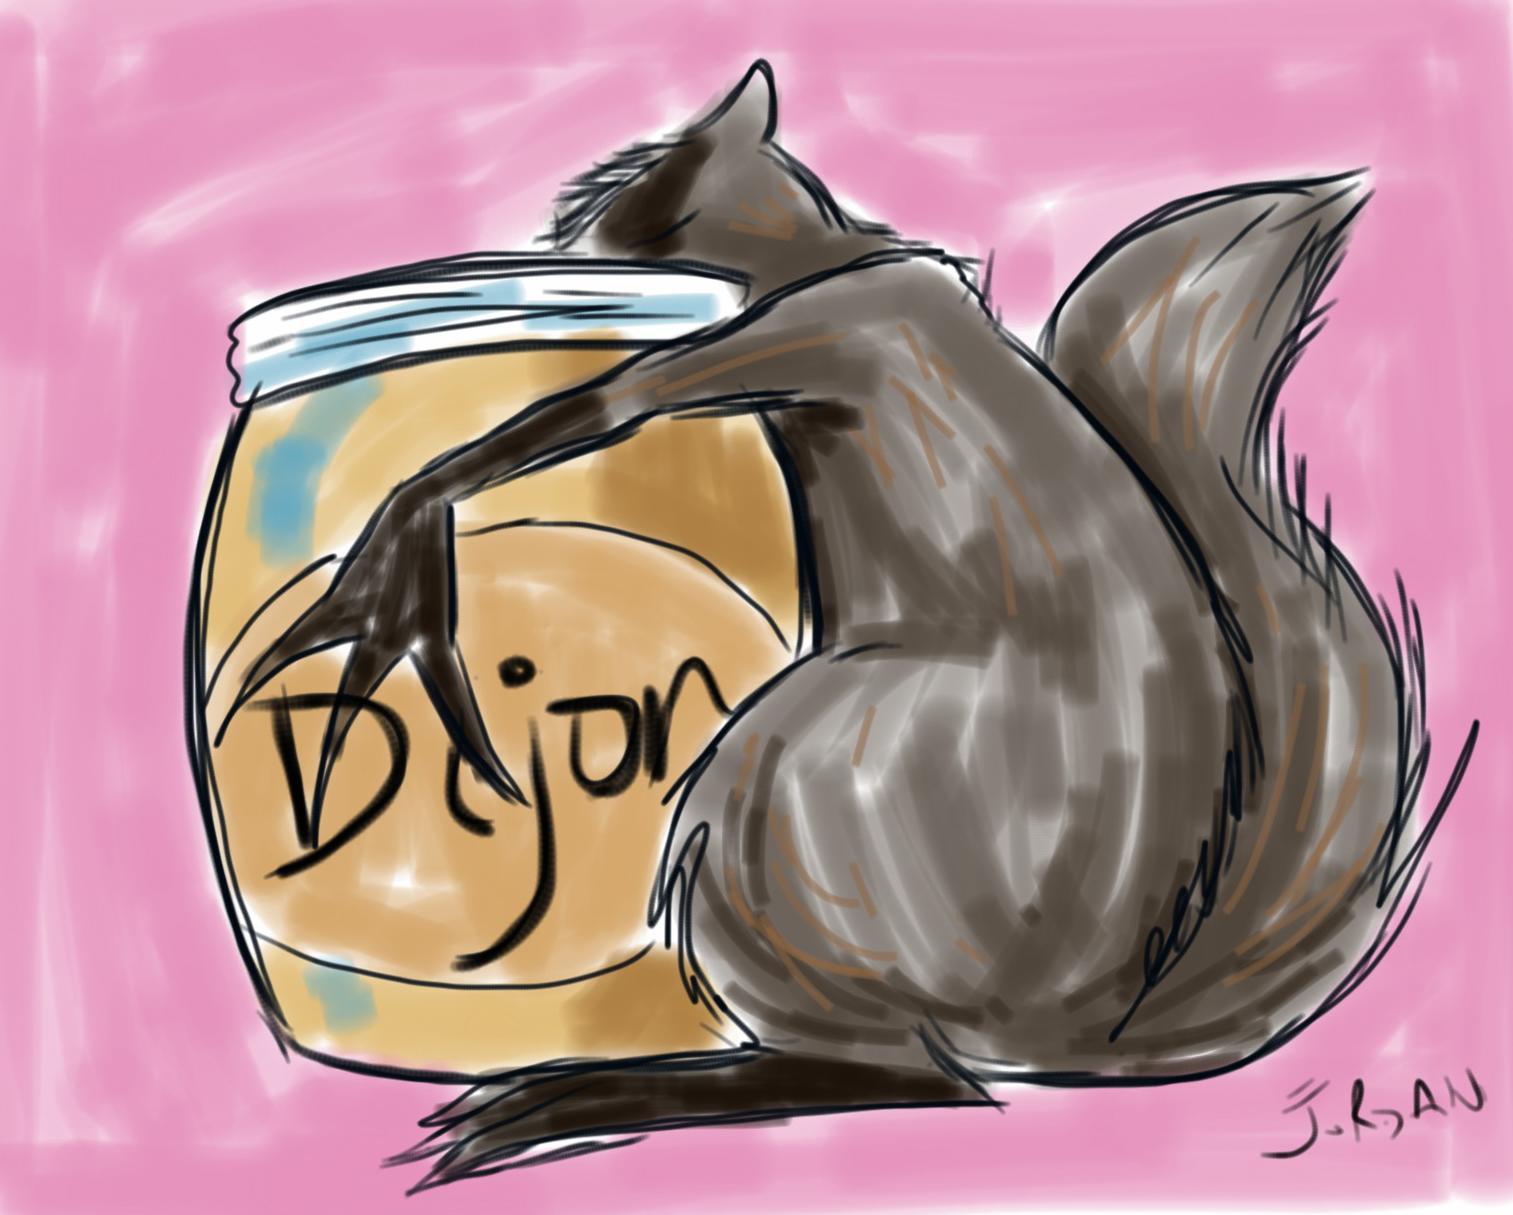 Drawing of badger eating dijon. GIRL, CRAFTED blog.